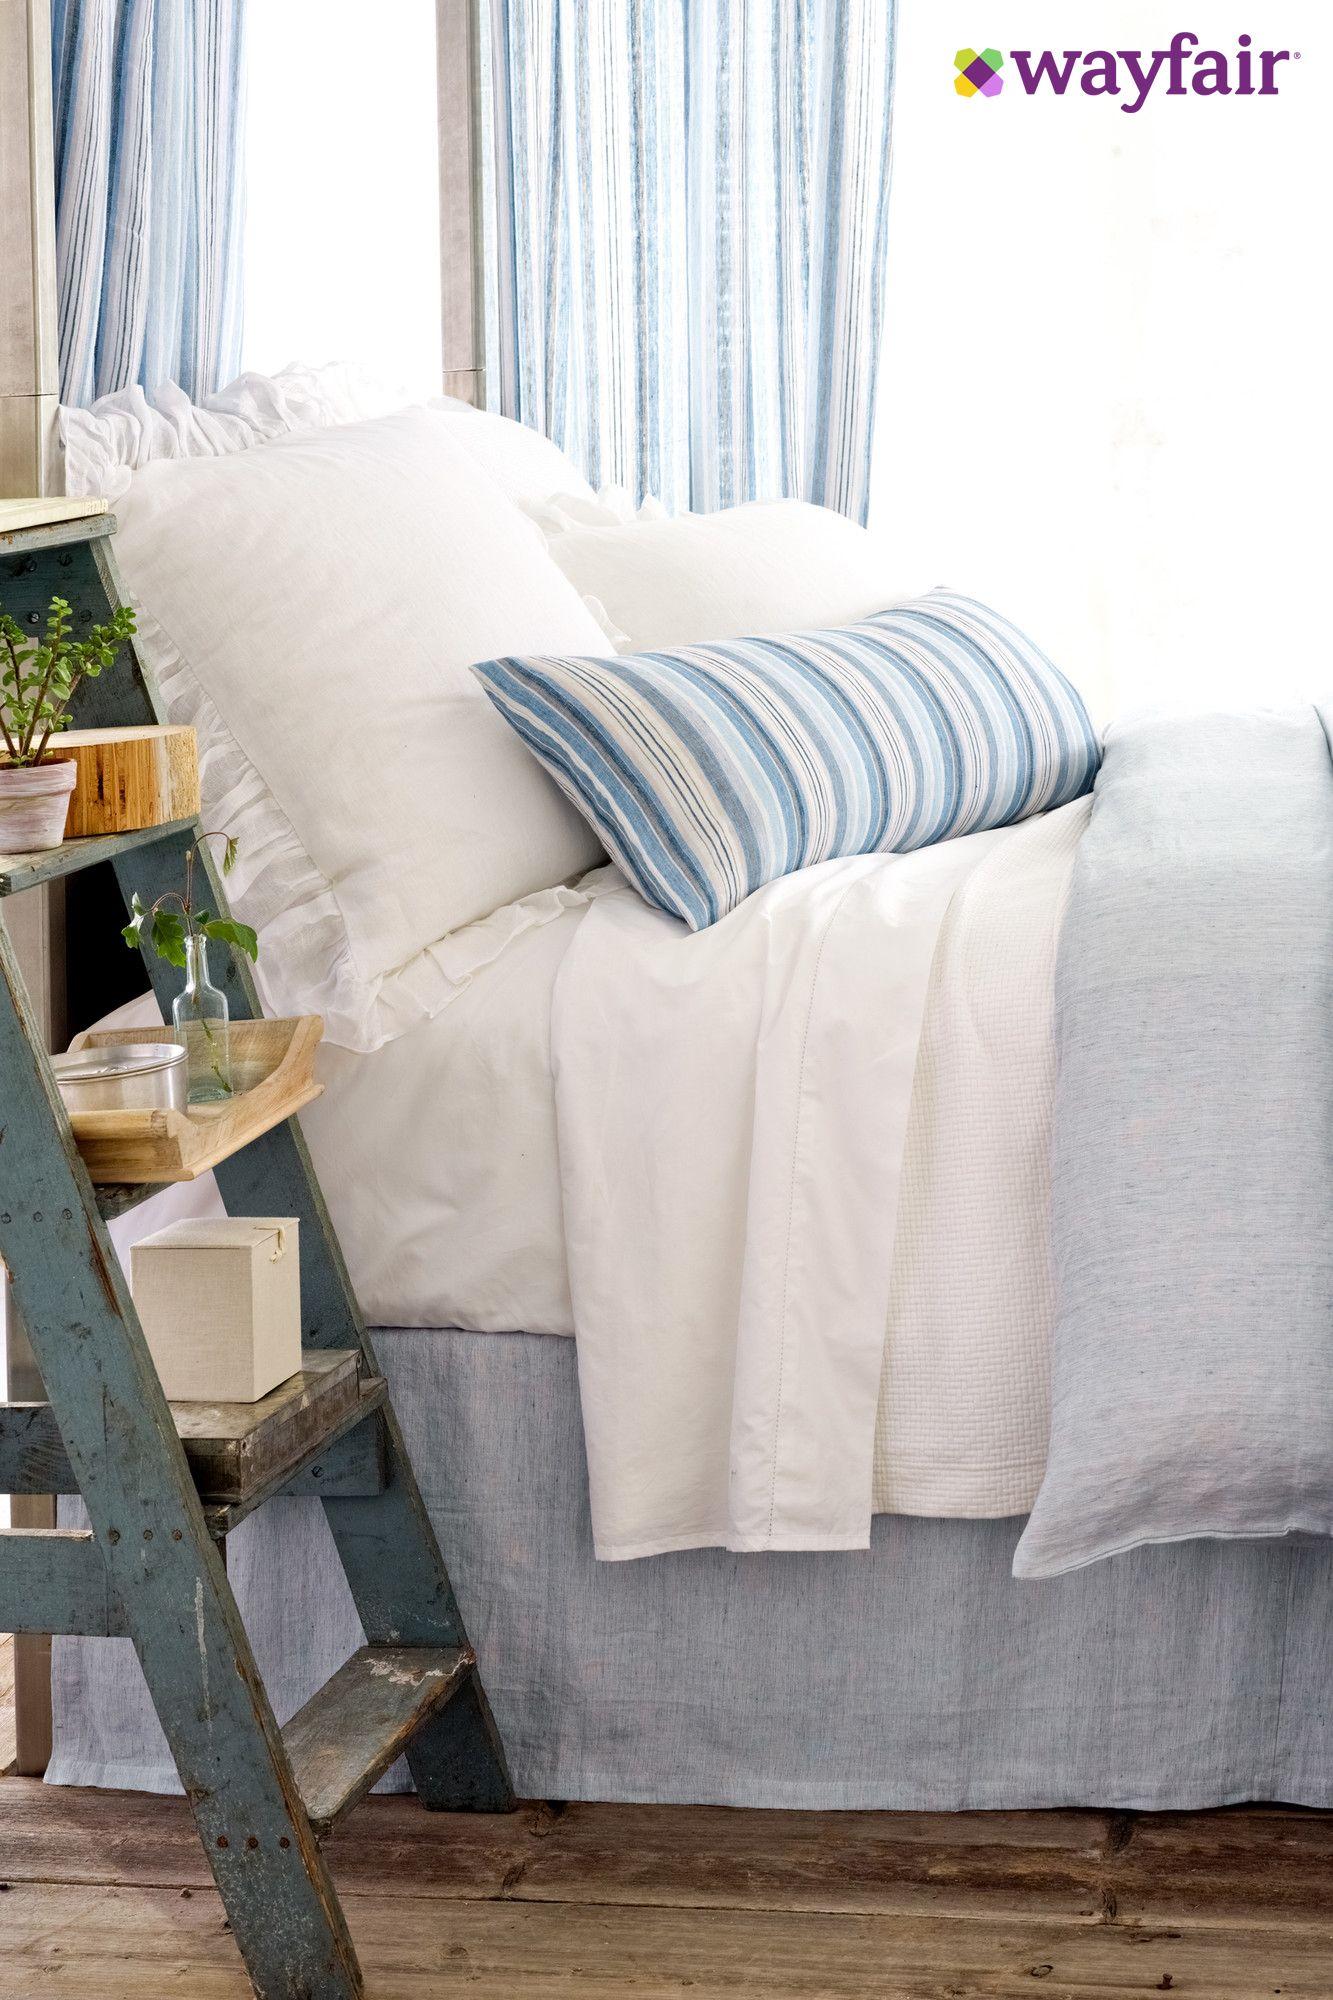 Sugarhouse Comforter Set Influencer Linen Duvet